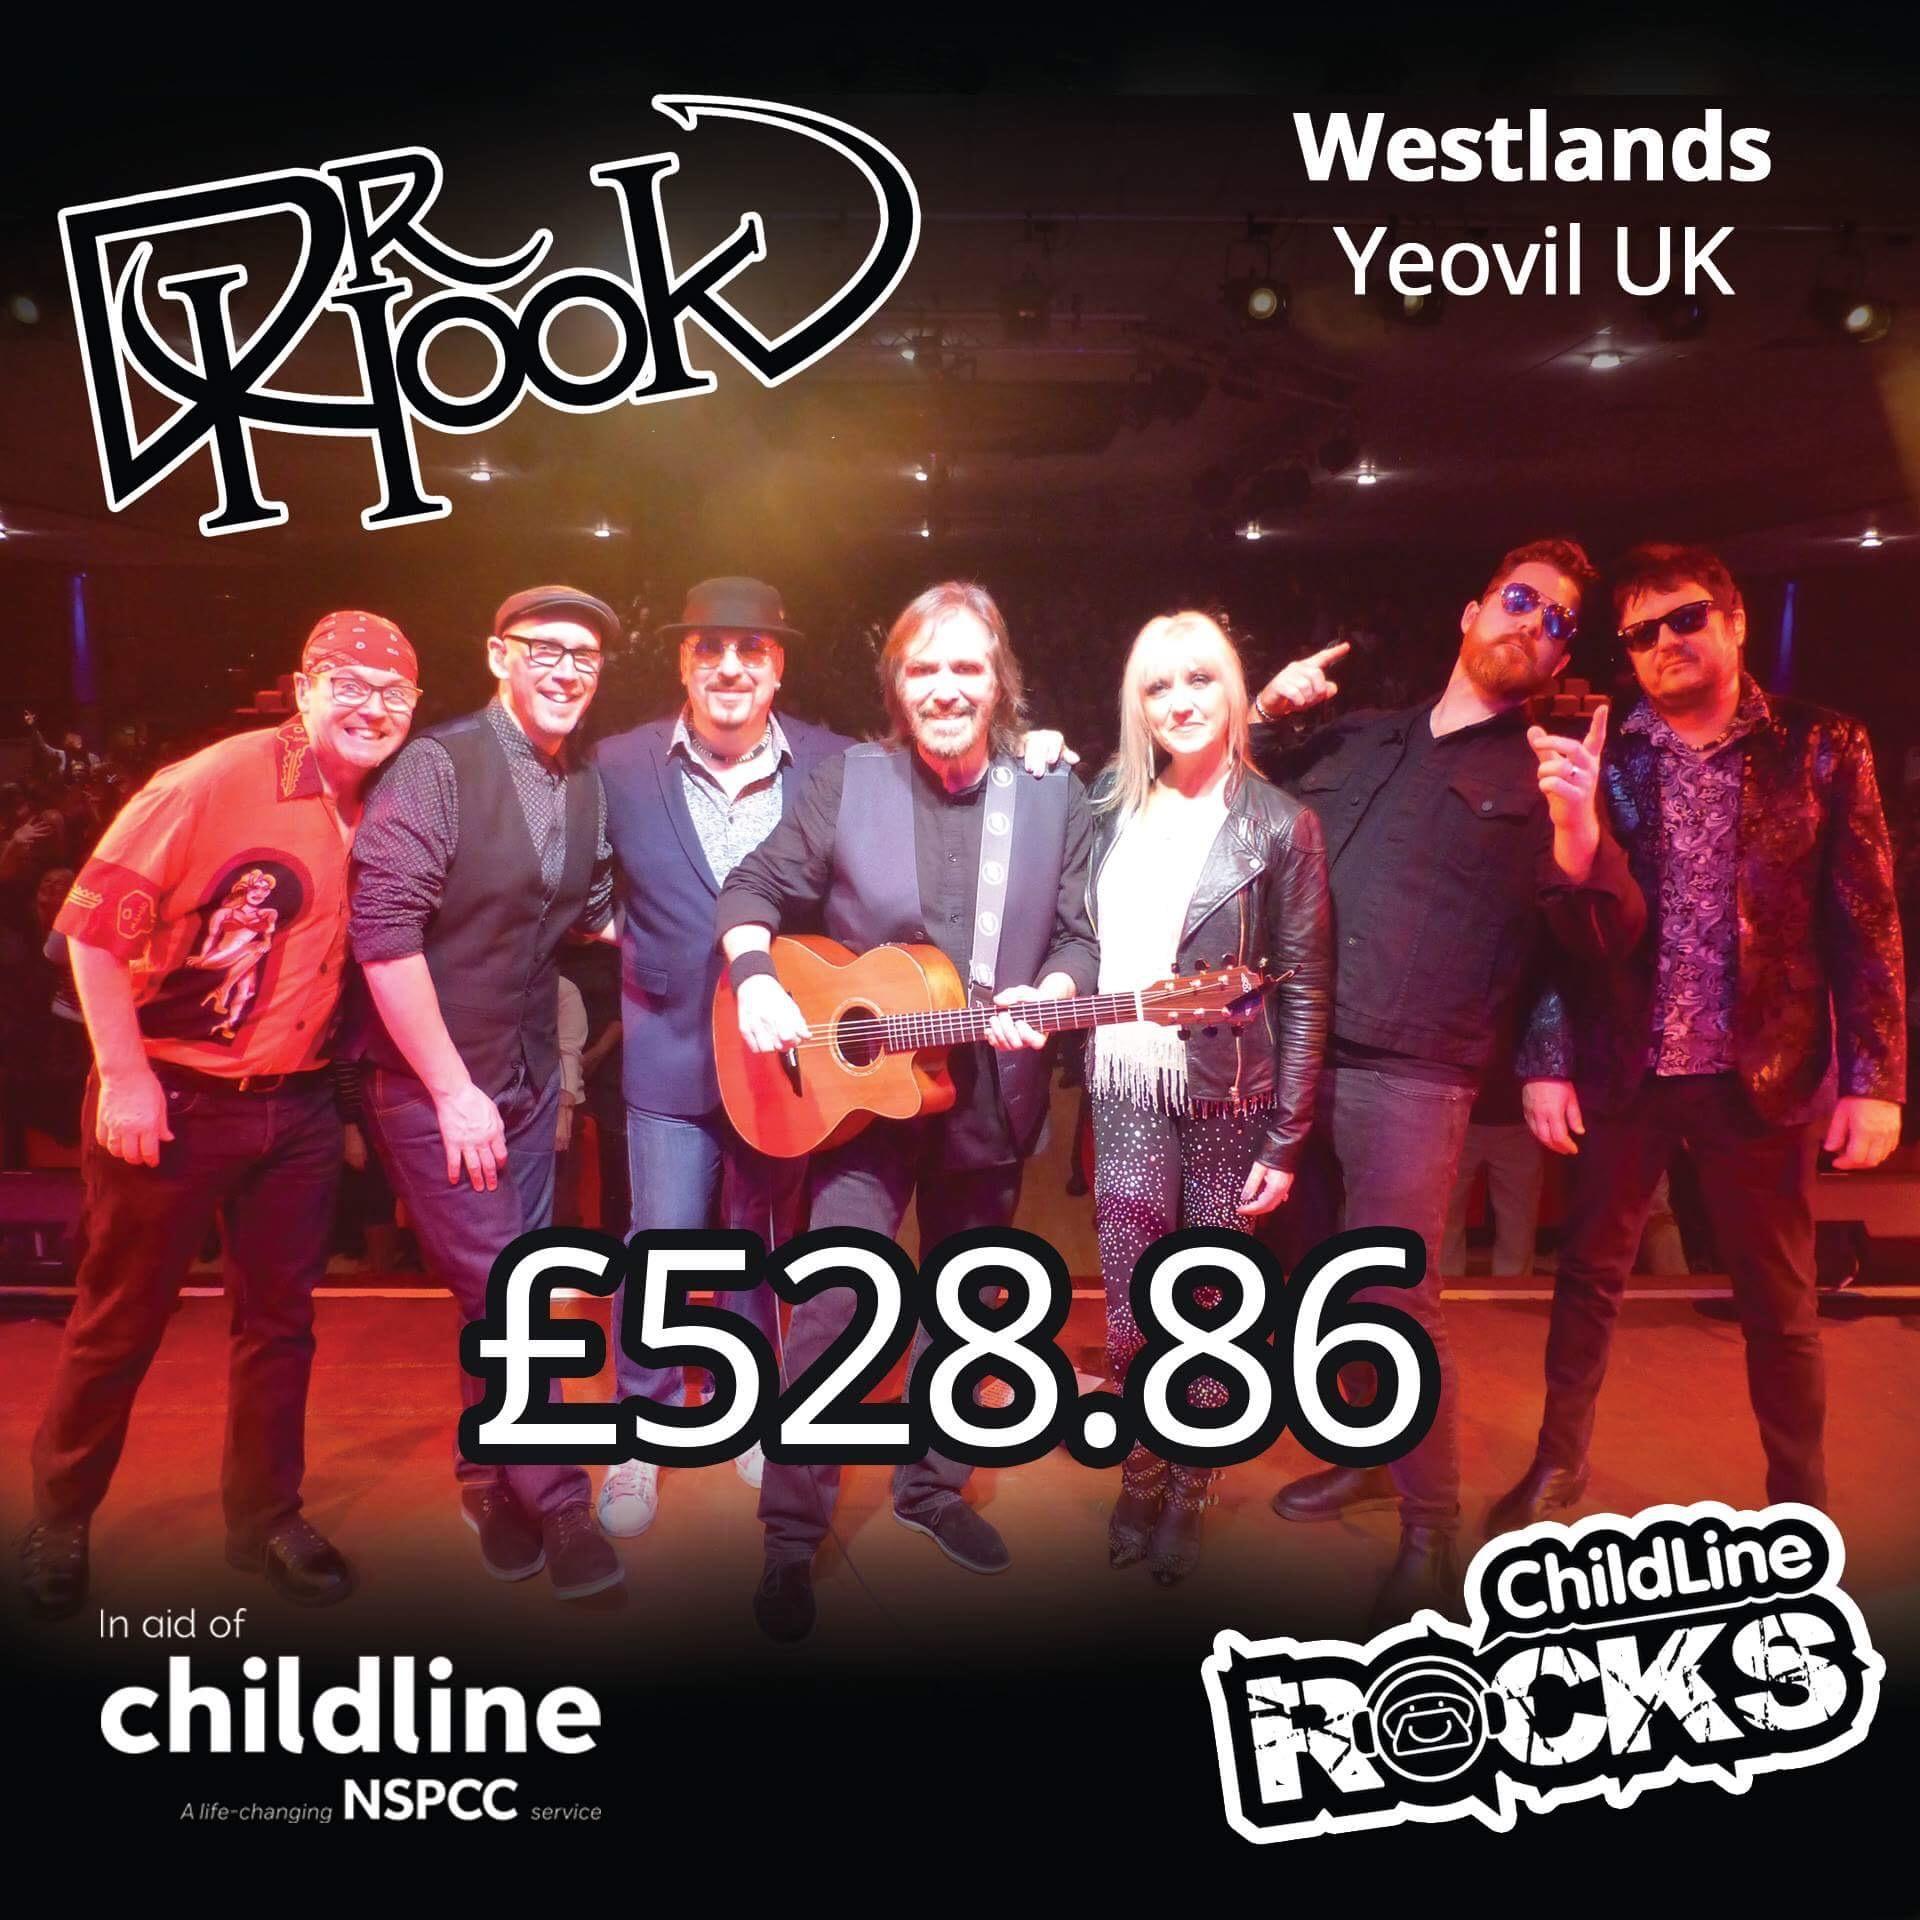 Dr Hook   UK & IE Tour   2017   Fundraising For NSPCC Childline   Yeovil UK